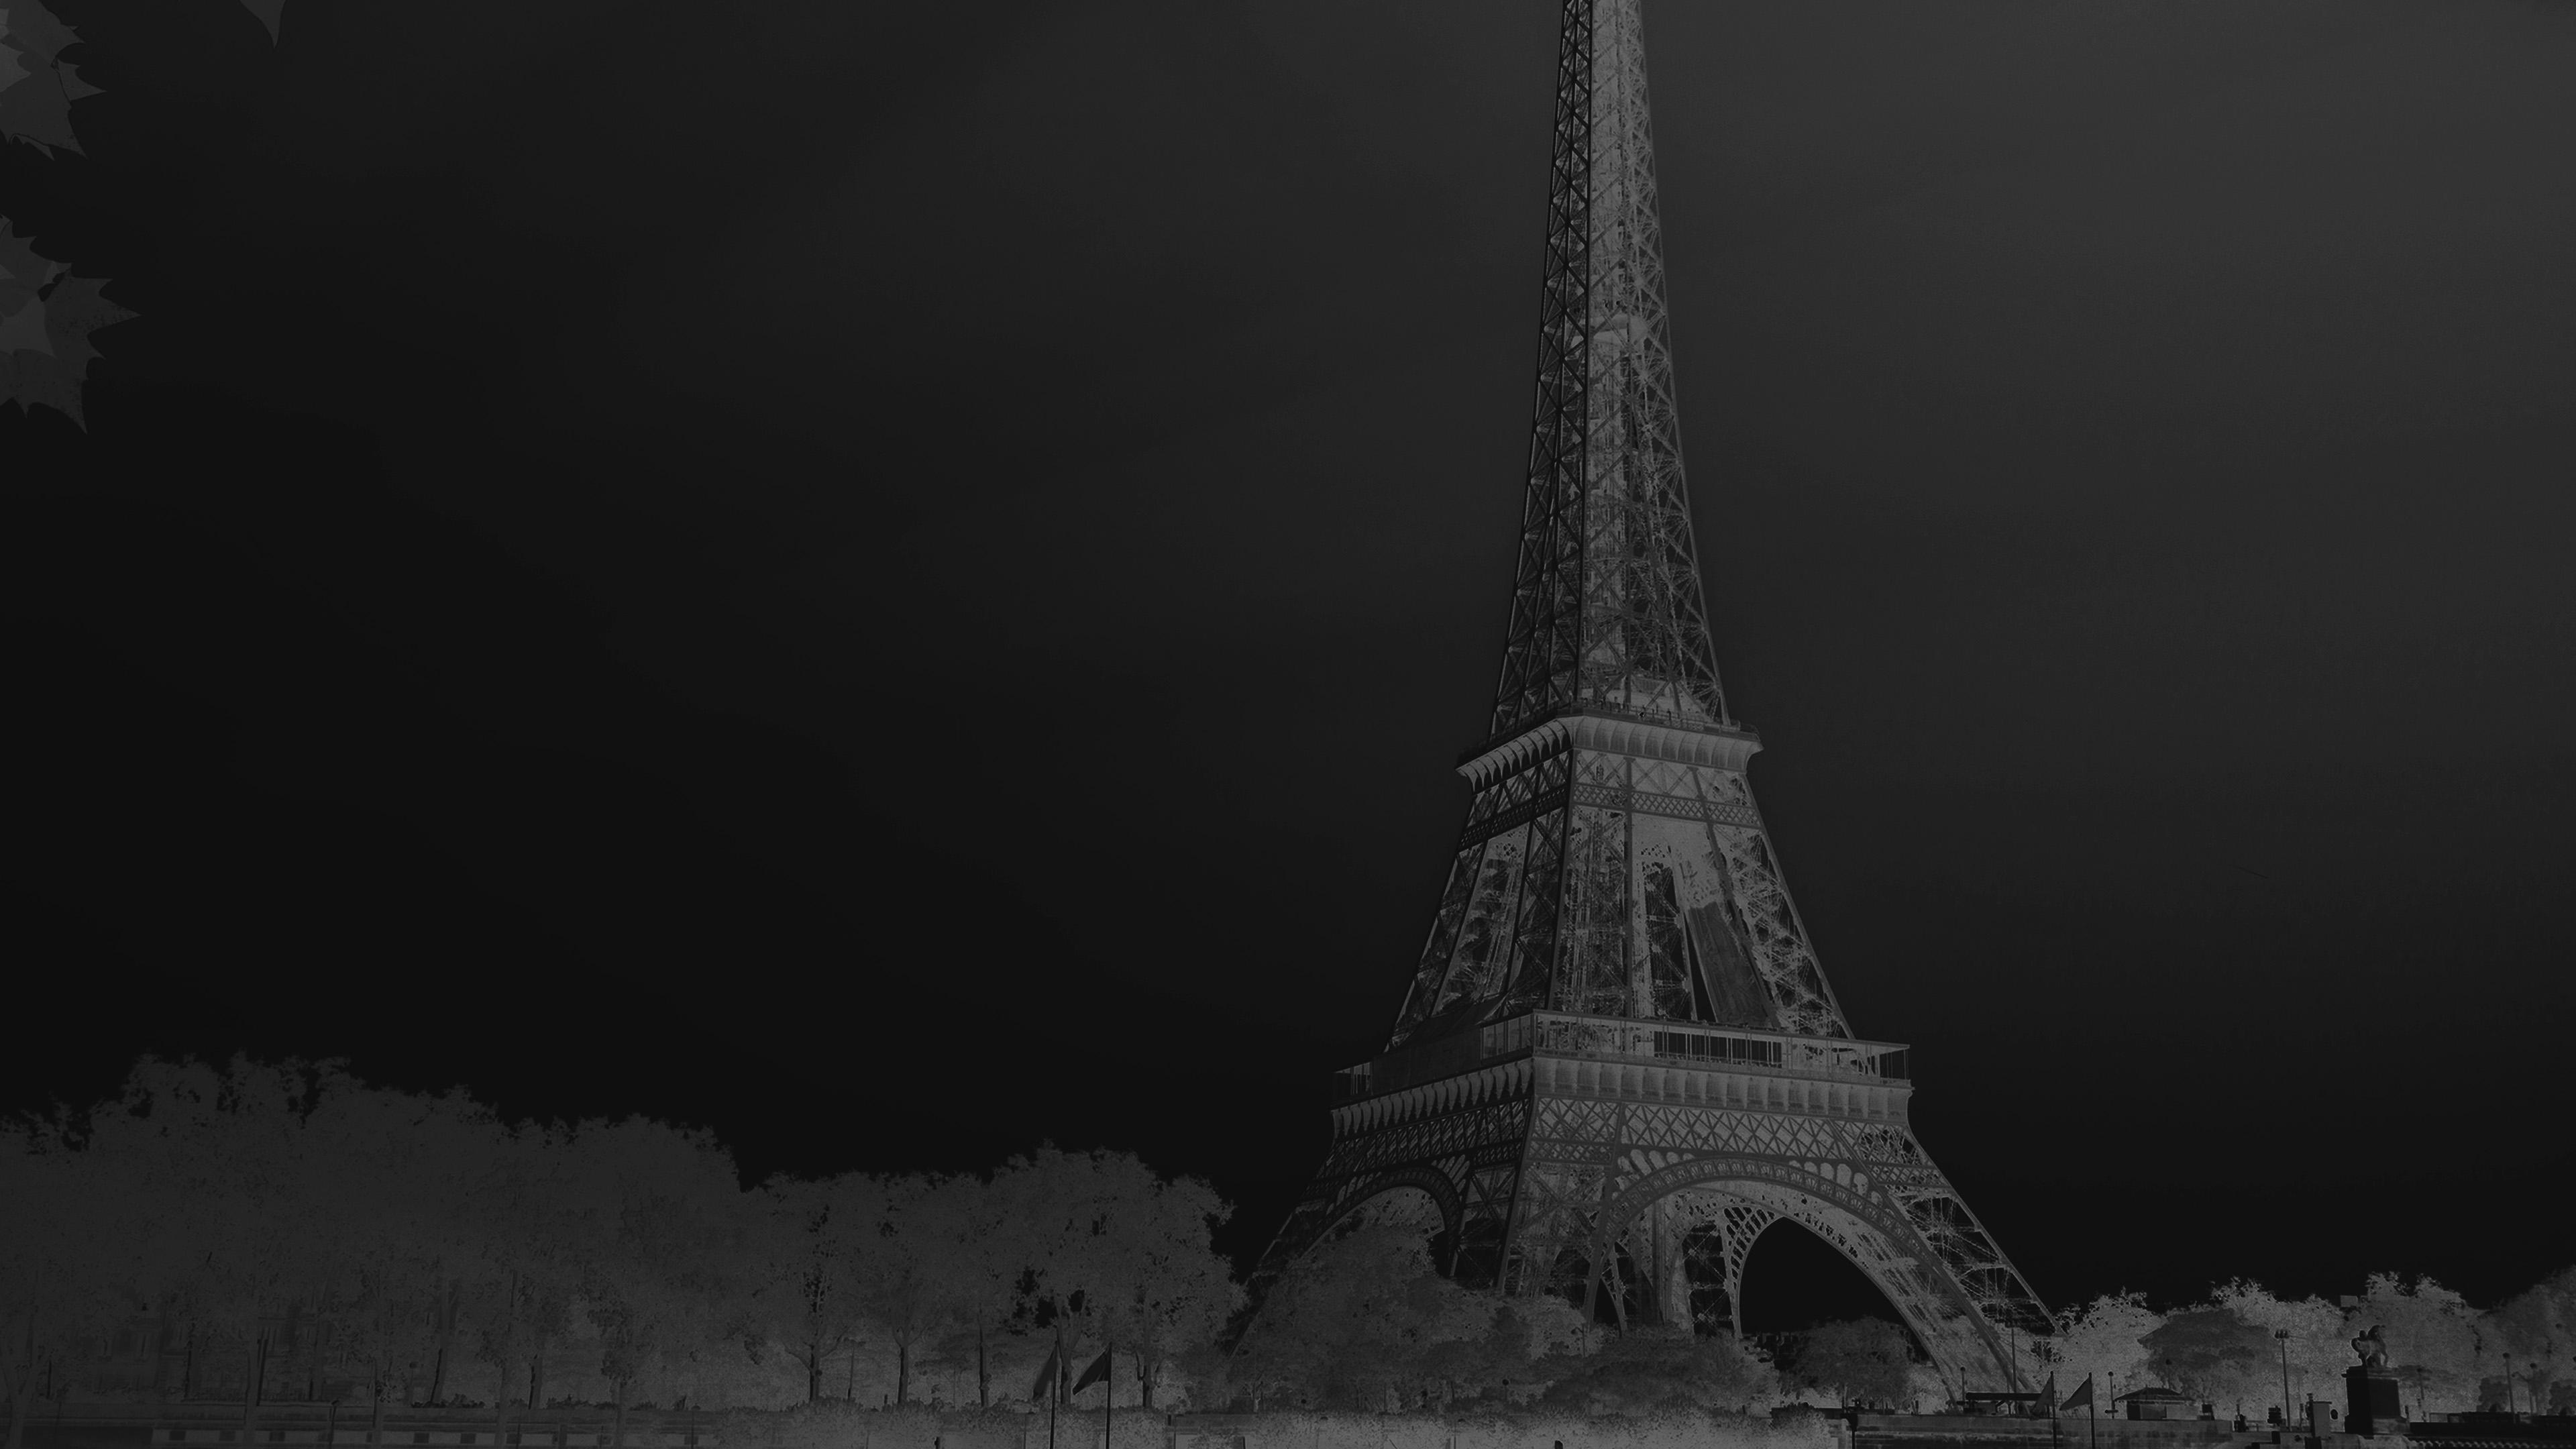 Na19 Sky Dark Bw Black Eiffel Tower Nature Paris City